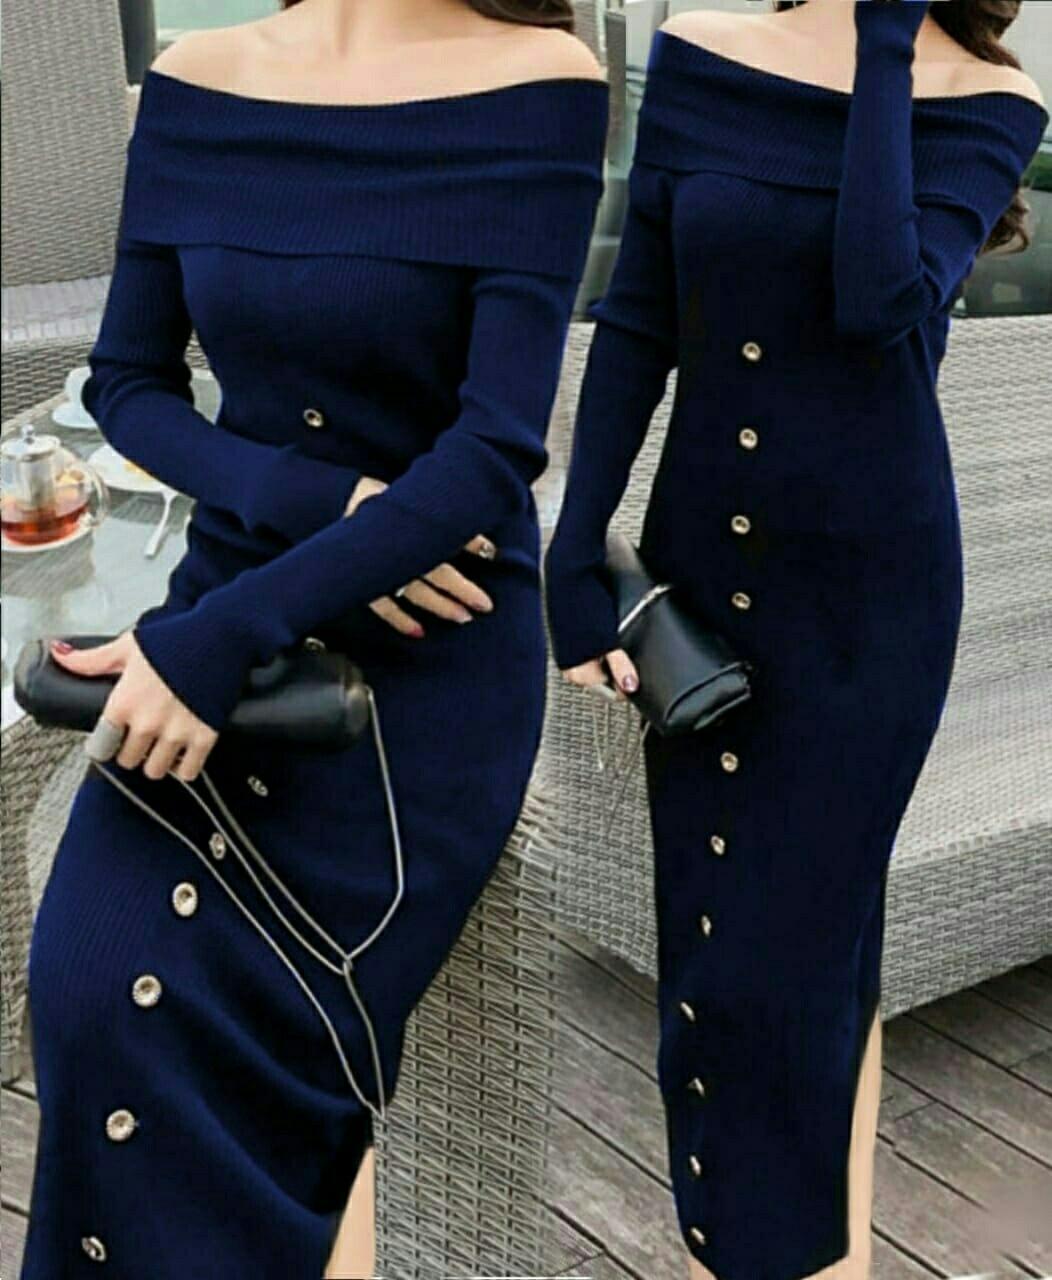 HSNFashion Dress Wanita    Baju Rajut    Dress Pesta    Pakaian Wanita   ce12d38e49